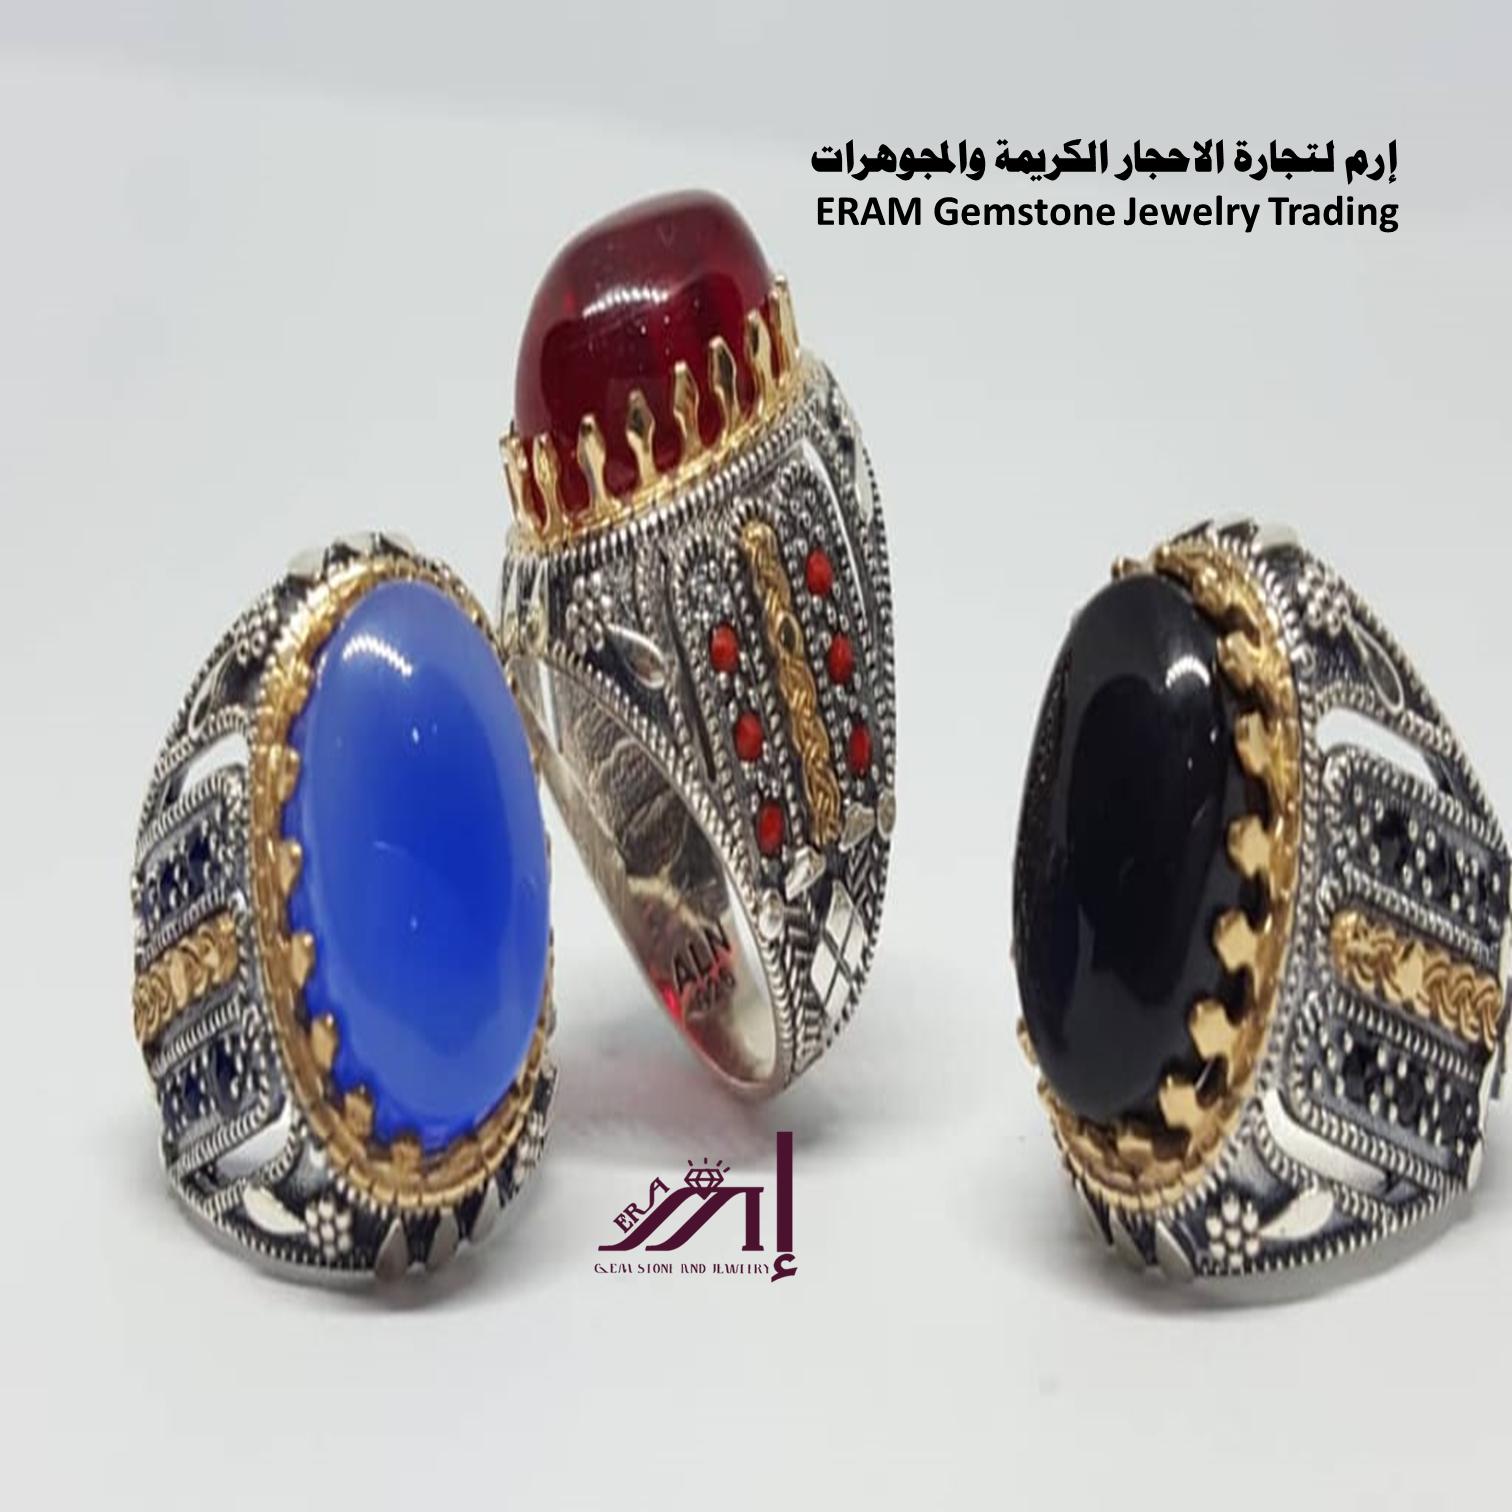 اتبع مشاعرك خواتم يماني عقيق ازرق واحمر كبدي واسود درجة اولى Agate مميز طبيعي100 للعرض Gemstones Gemstone Rings Gemstone Jewelry